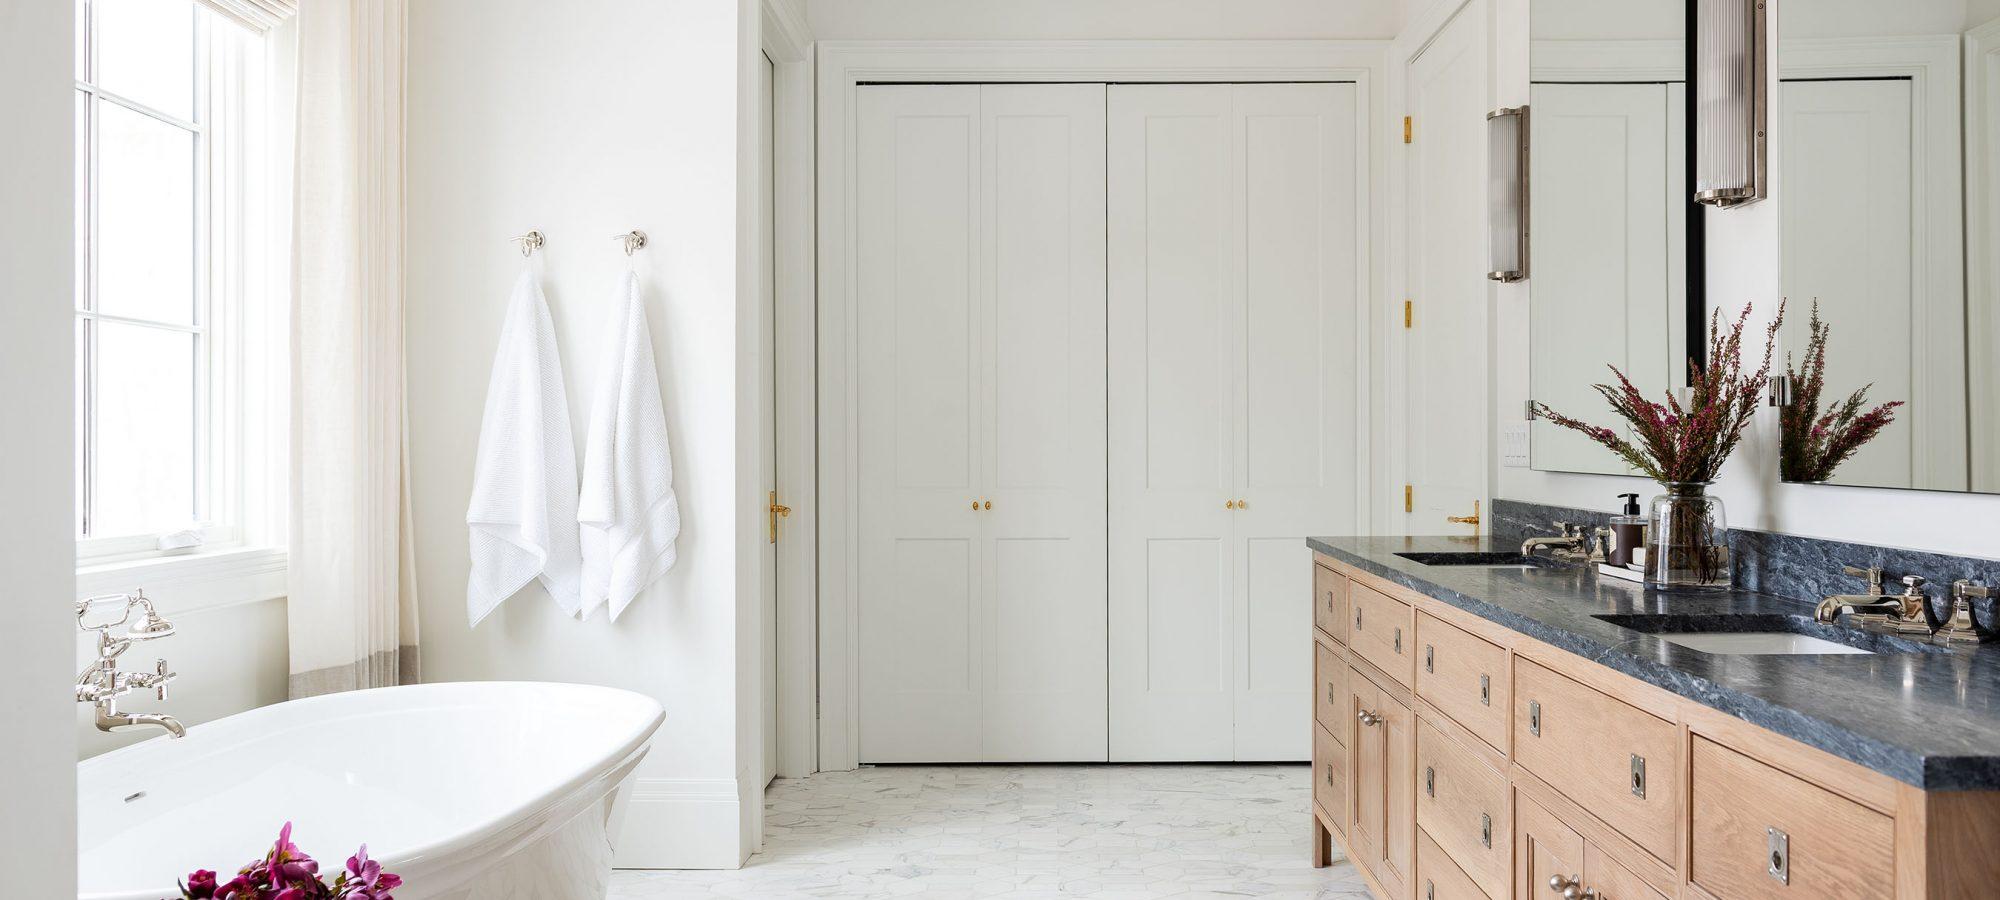 The McGee Home: Master Bathroom Webisode